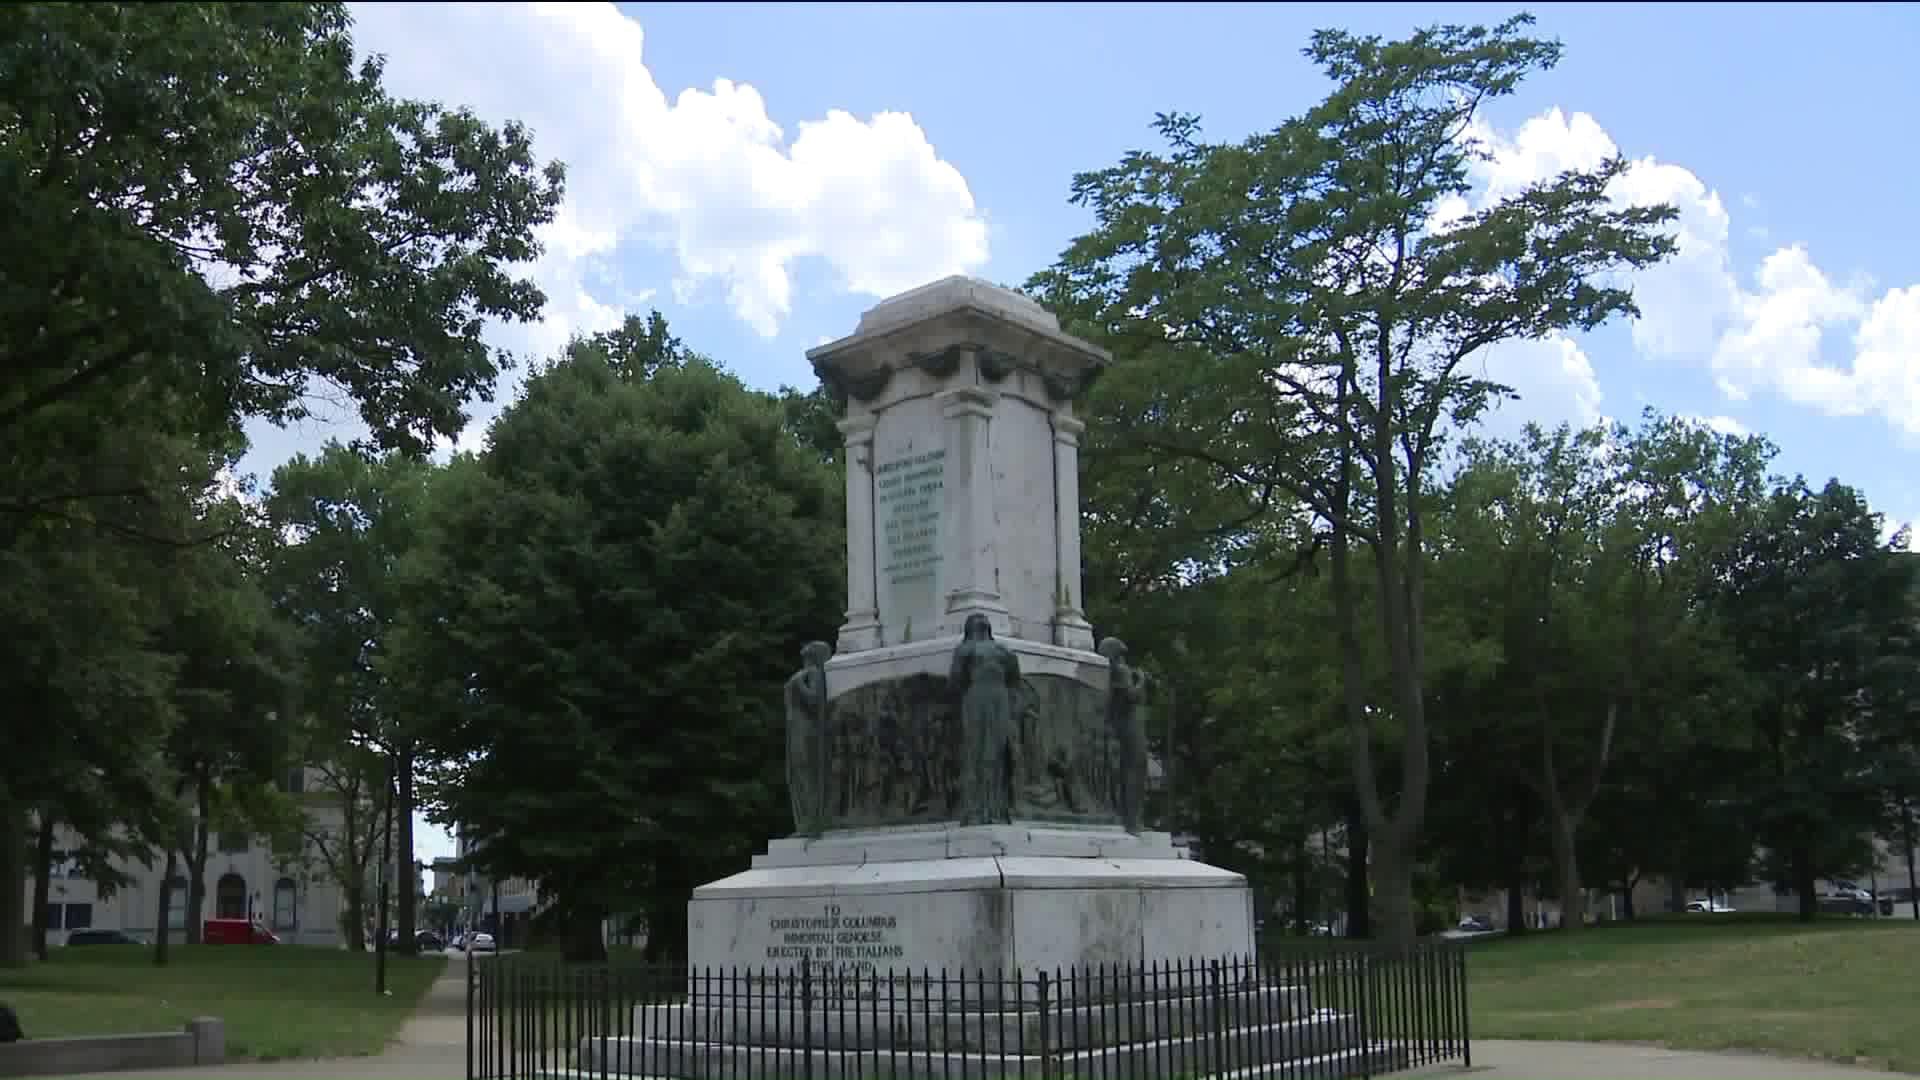 Newark Columbus Statue.jpeg